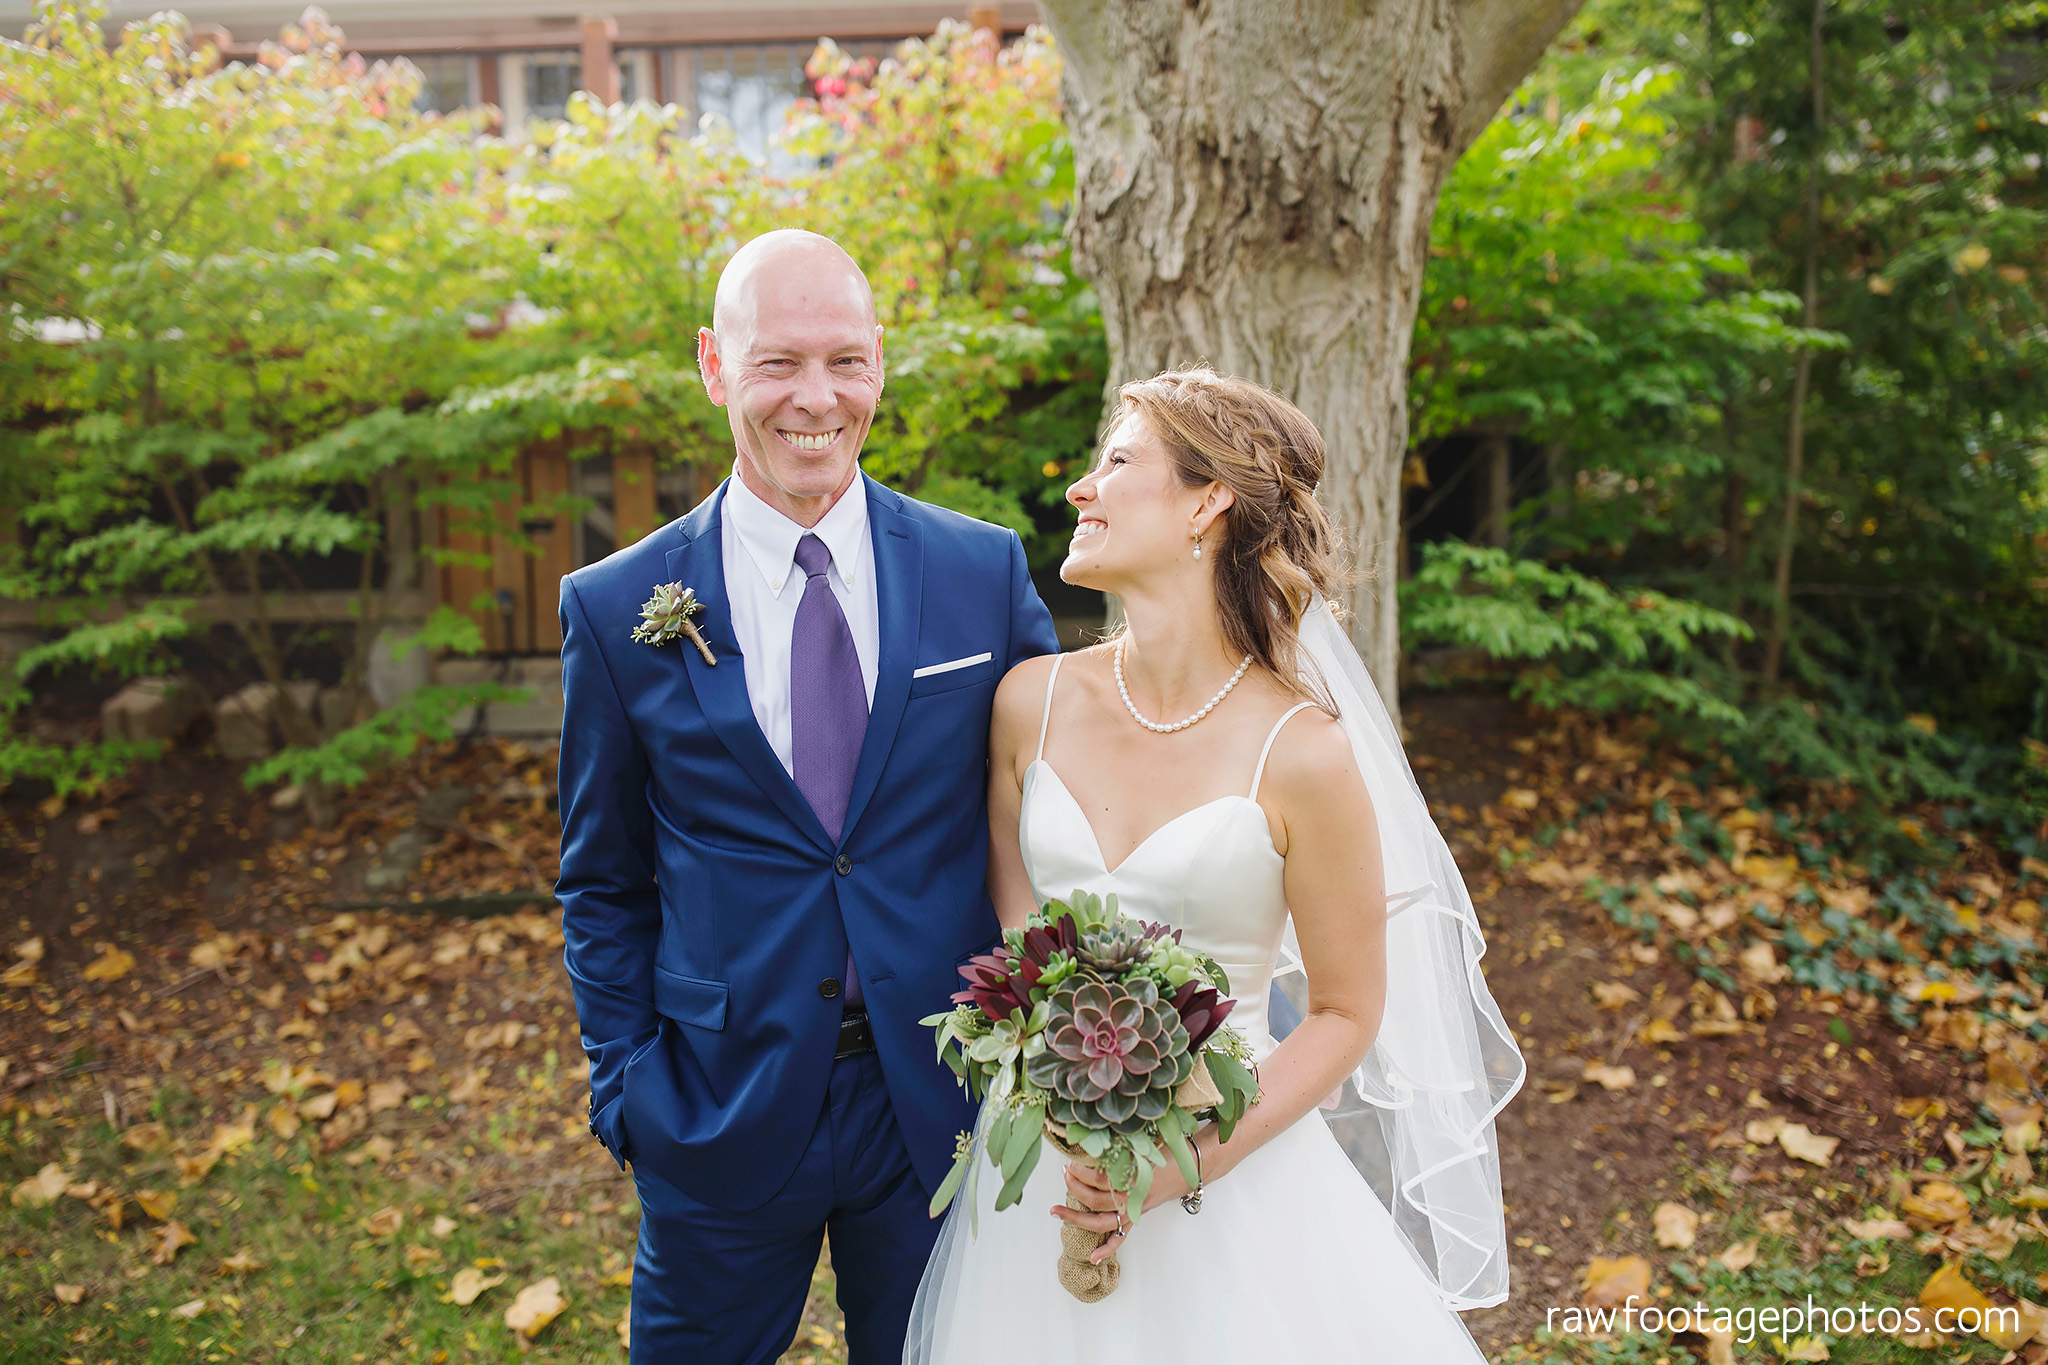 london_ontario_wedding_photographer-civic_gardens-springbank_park-succulent_bouquet-fall_wedding-bridge-raw_footage_photography016.jpg